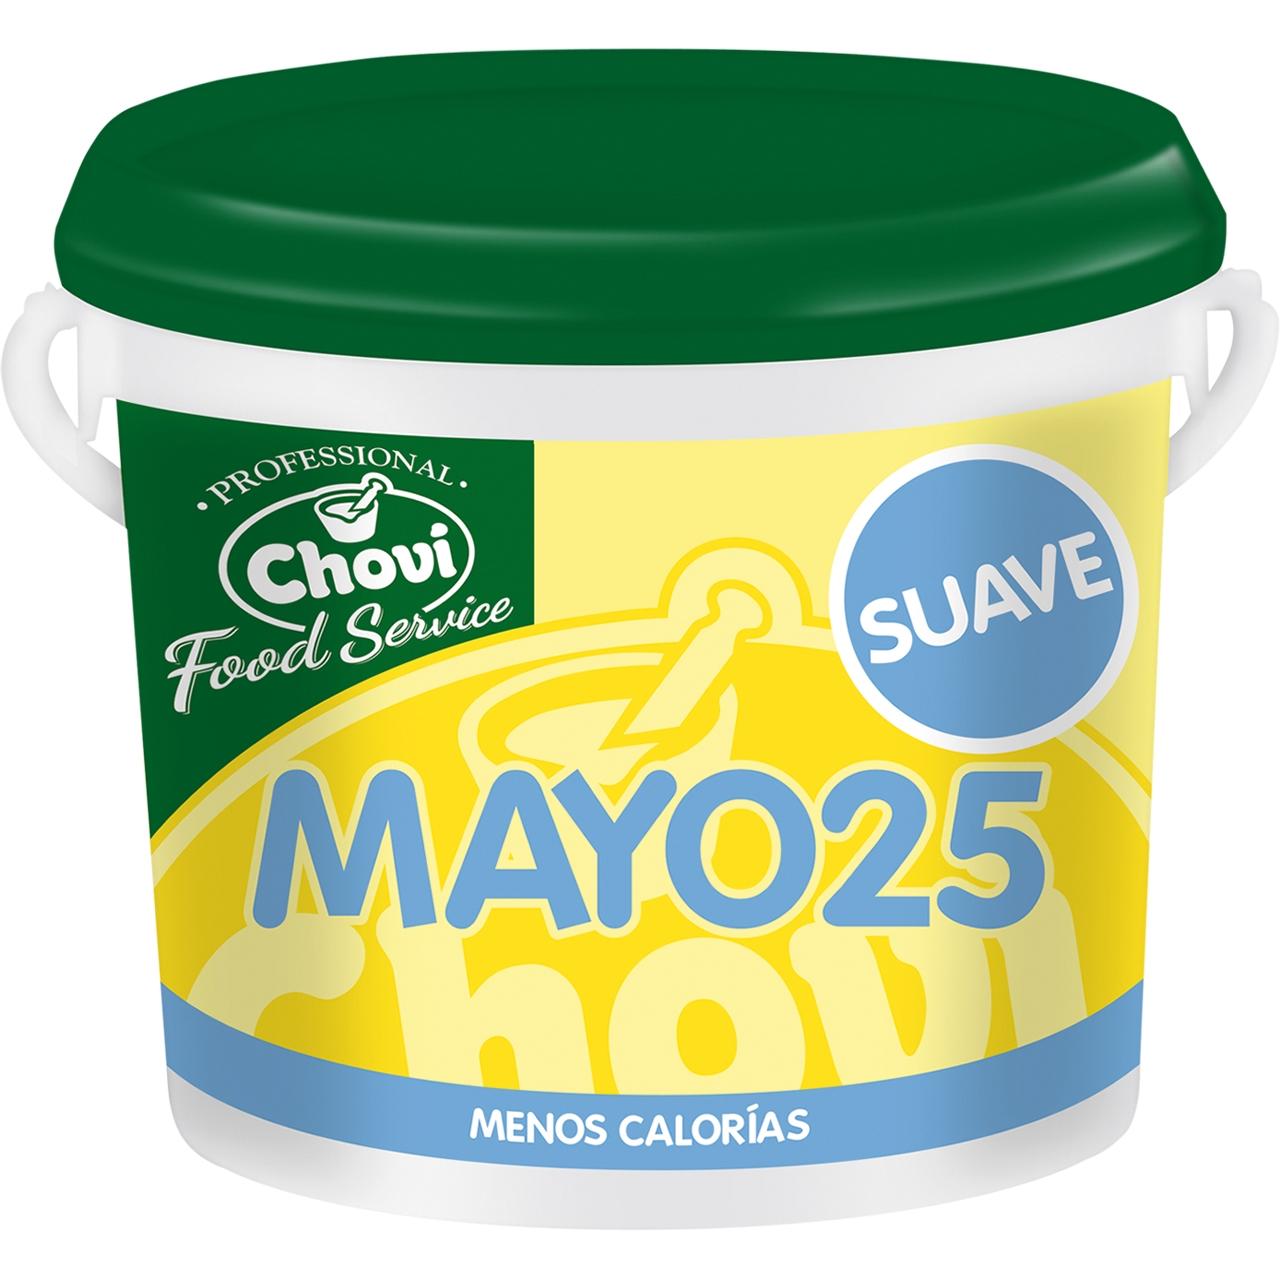 Mayo 25 salsa fina especial hosteleria 3,6l. Choví